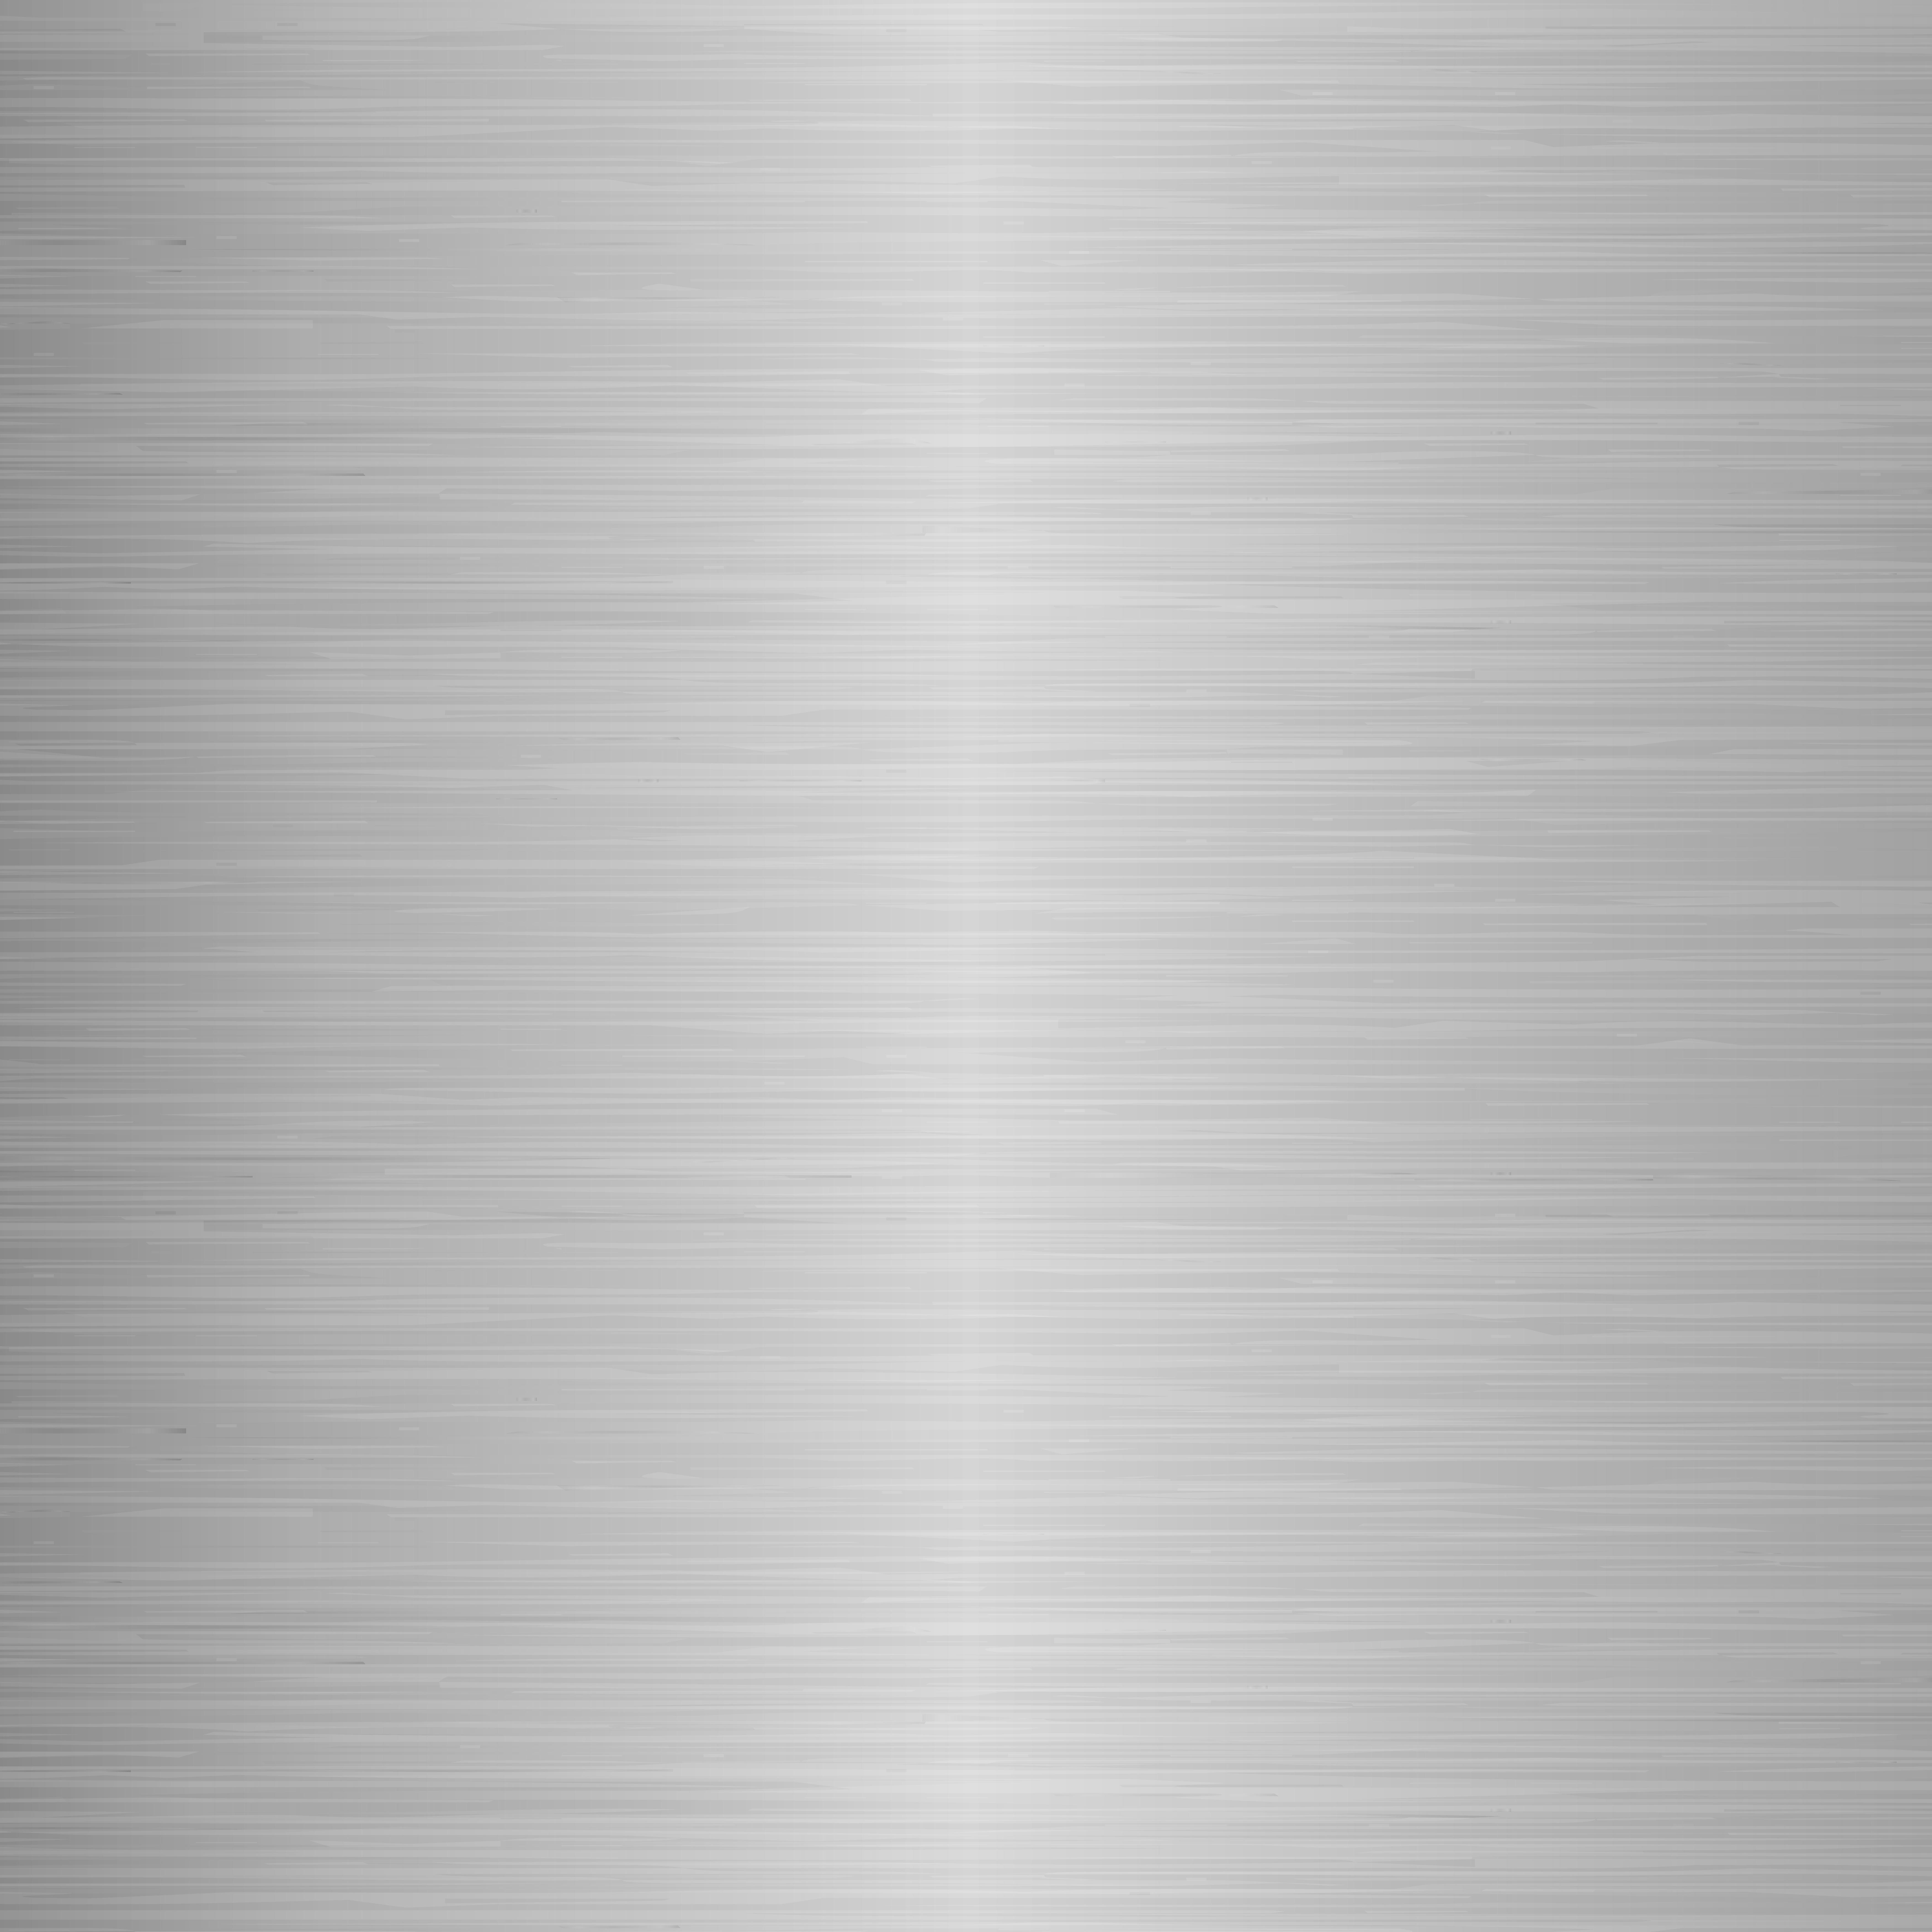 Silver Metal Background Metal Background Metal Texture Brushed Metal Texture